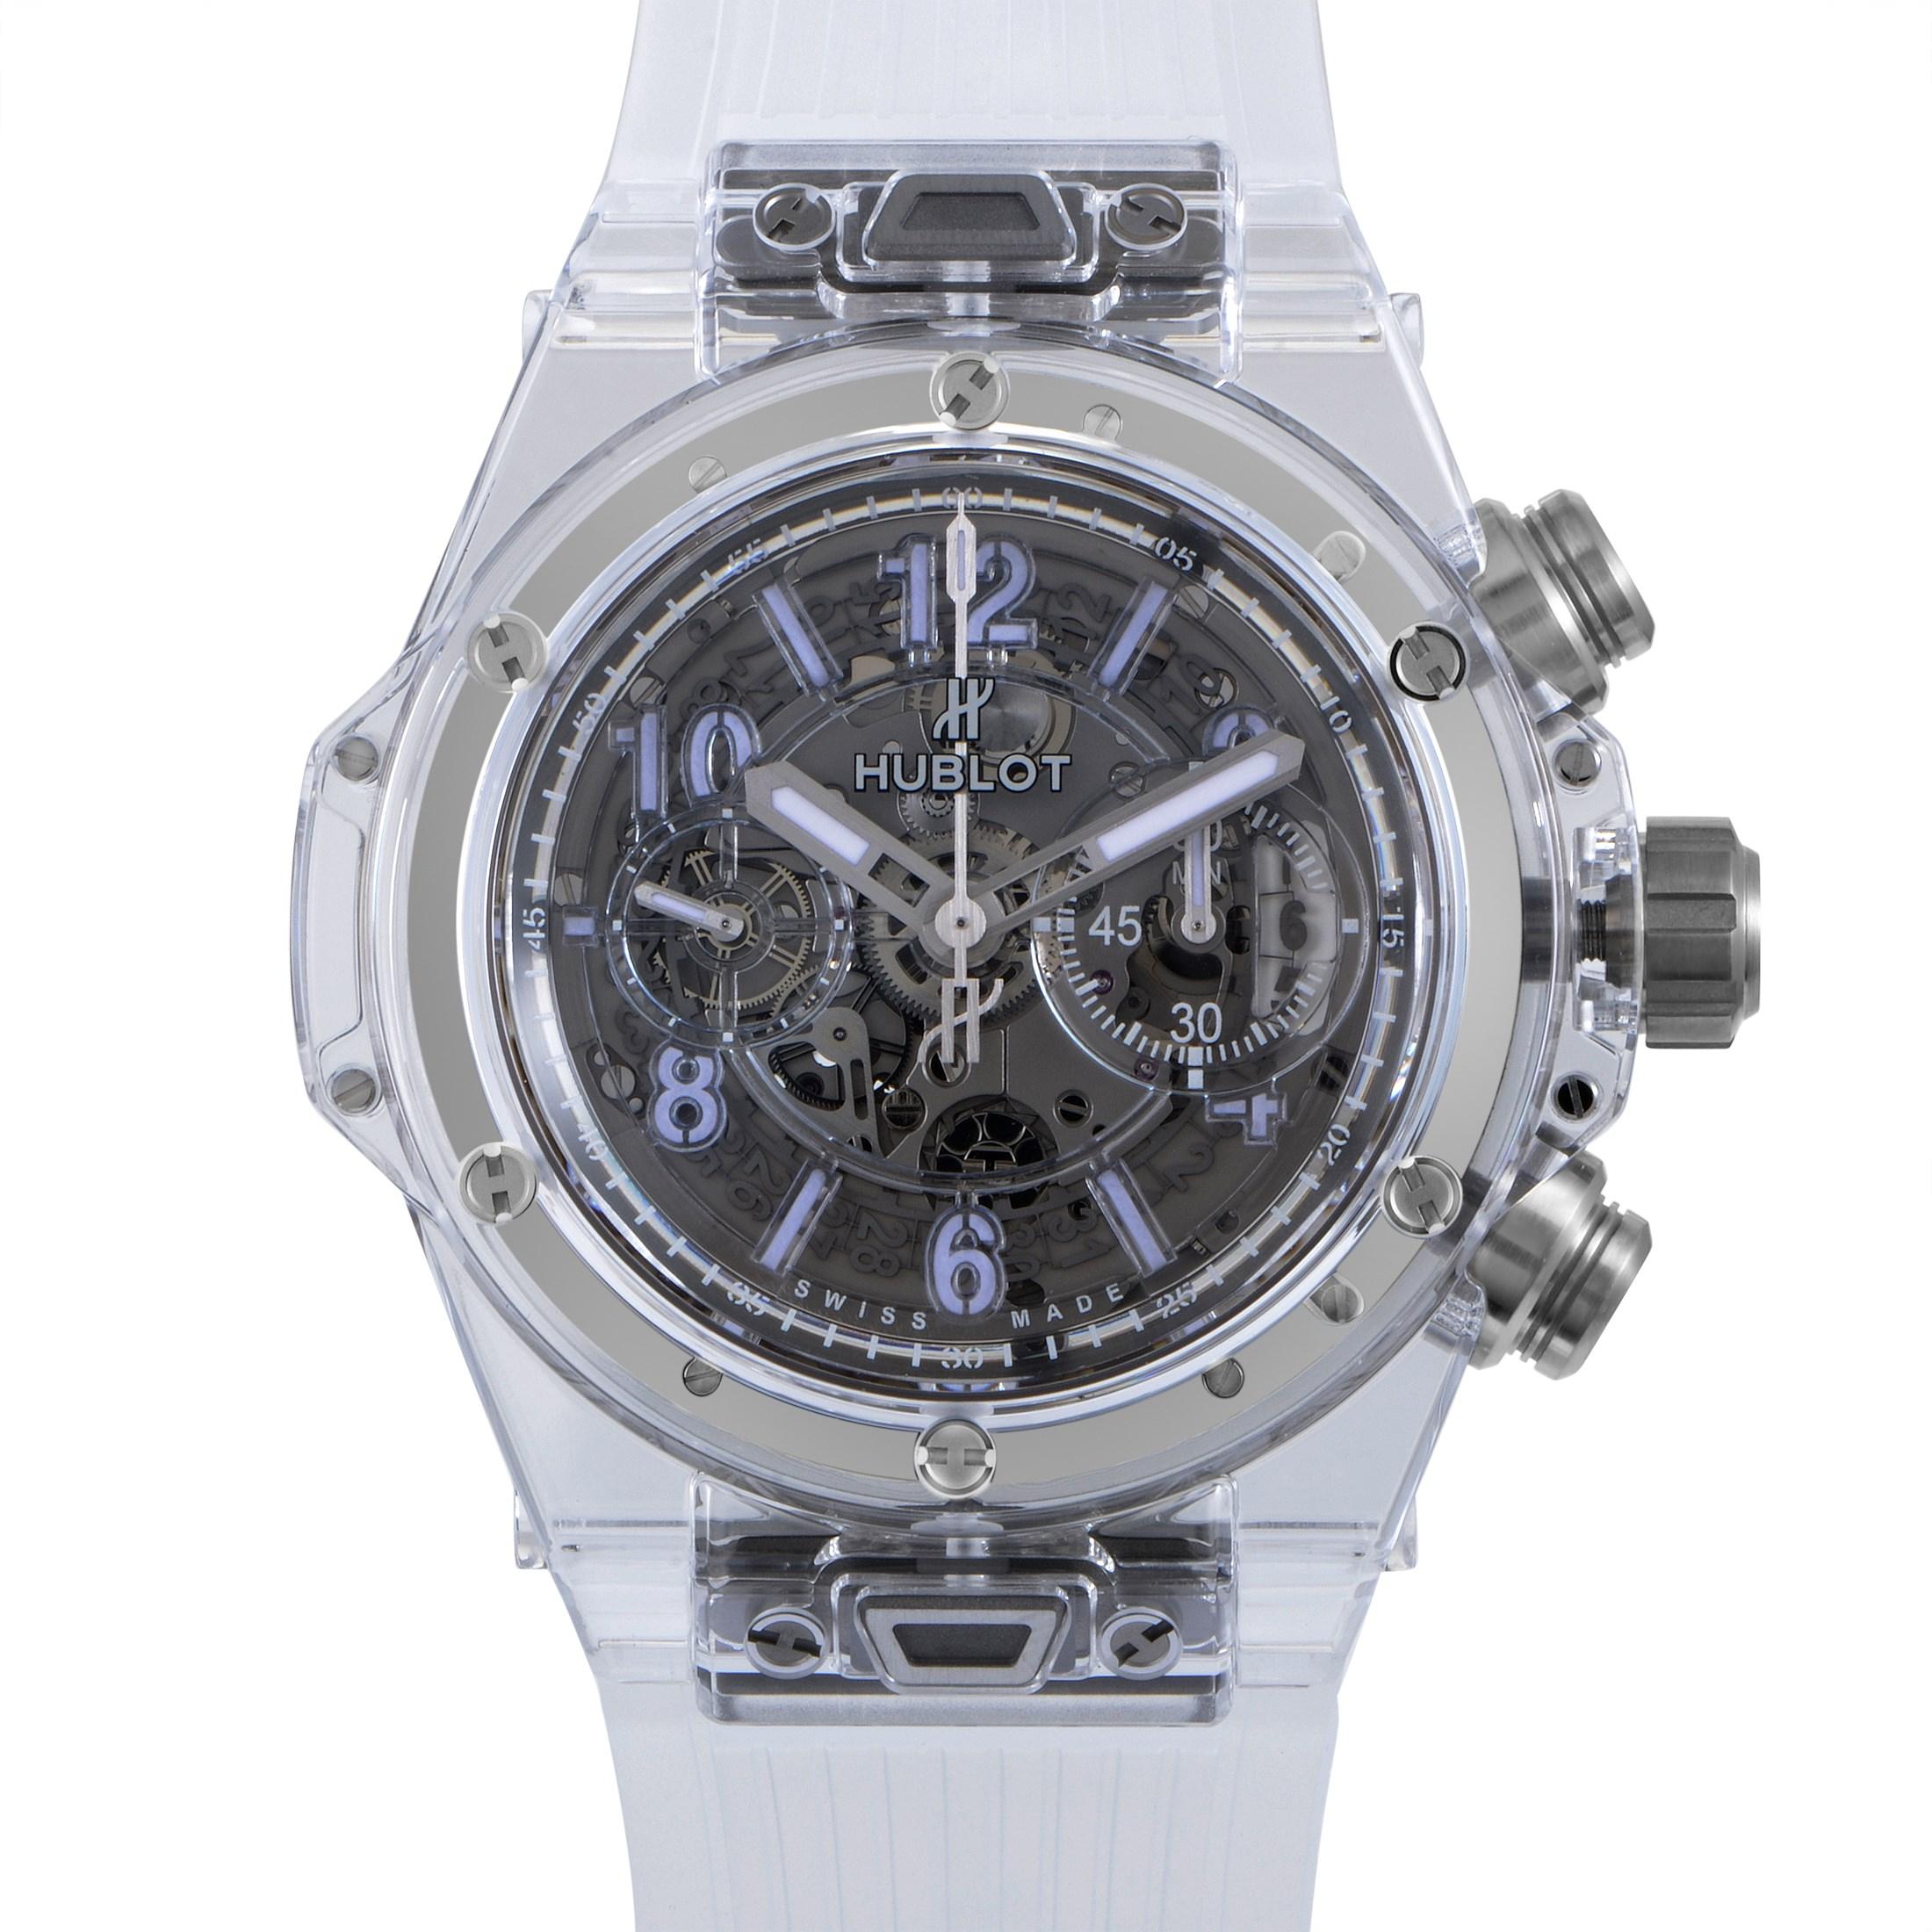 Big Bang Unico Sapphire Men's Chronograph Watch 411.JX.4802.RT